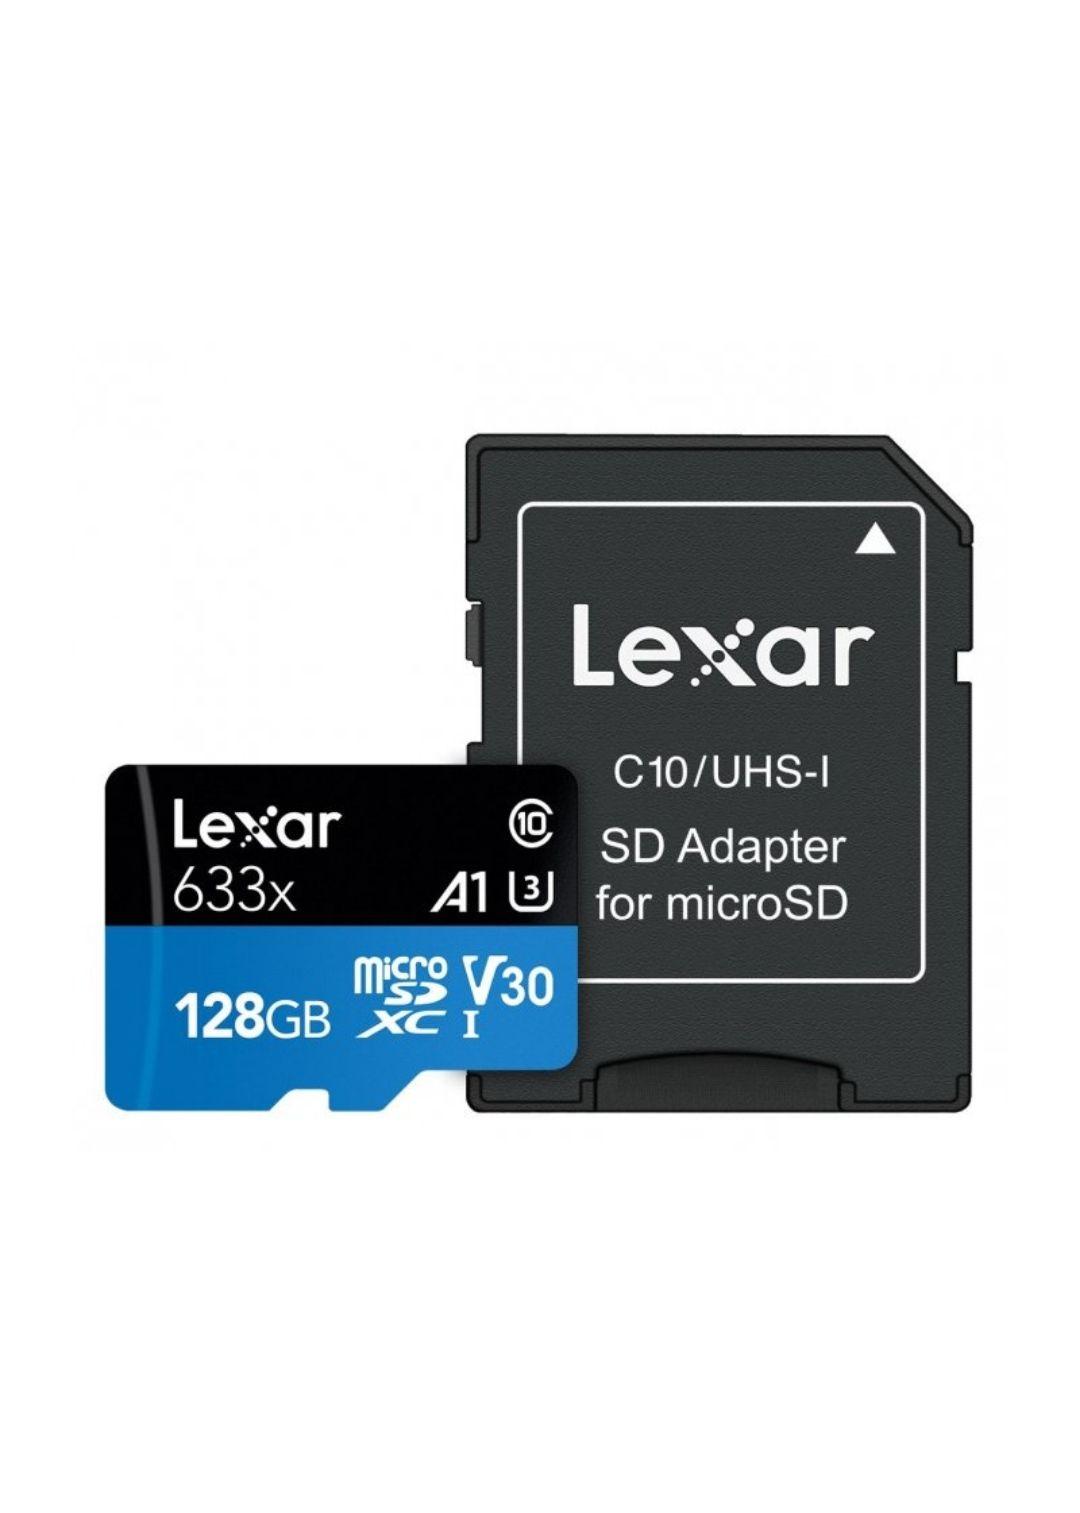 Lexar 128GB microSDXC High-Performance 633x UHS-I A1 V30